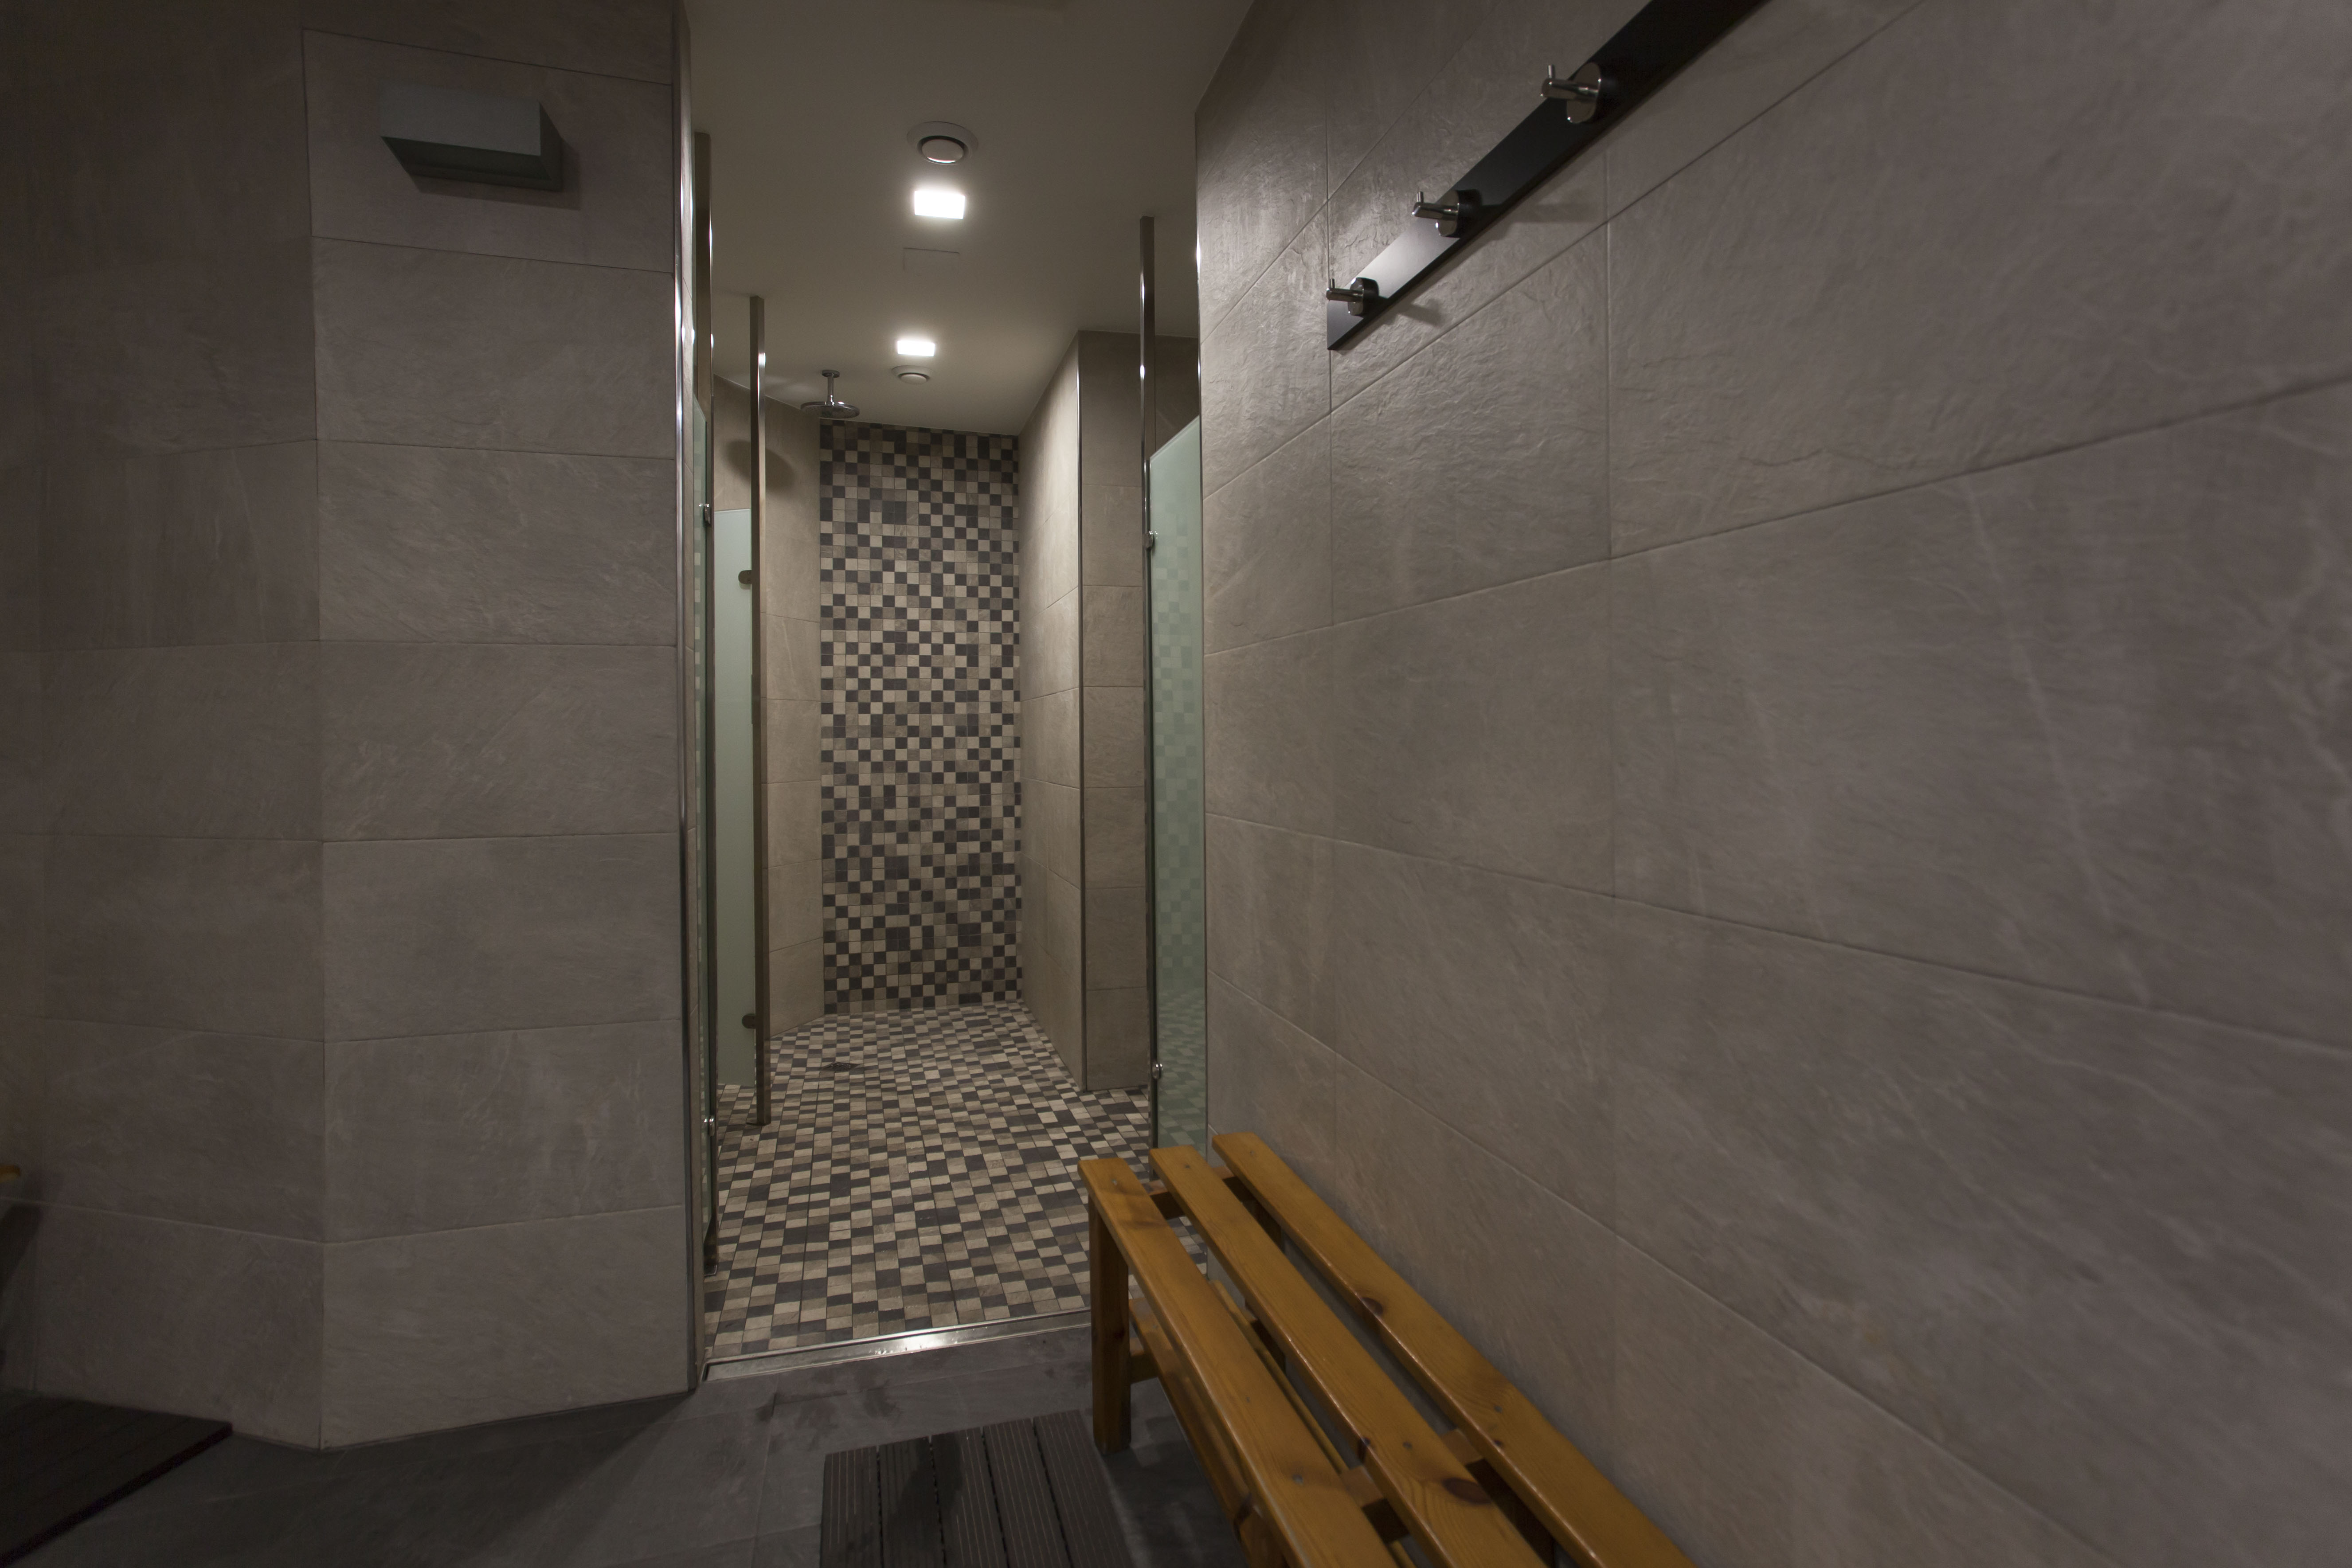 Baños en gimnasio